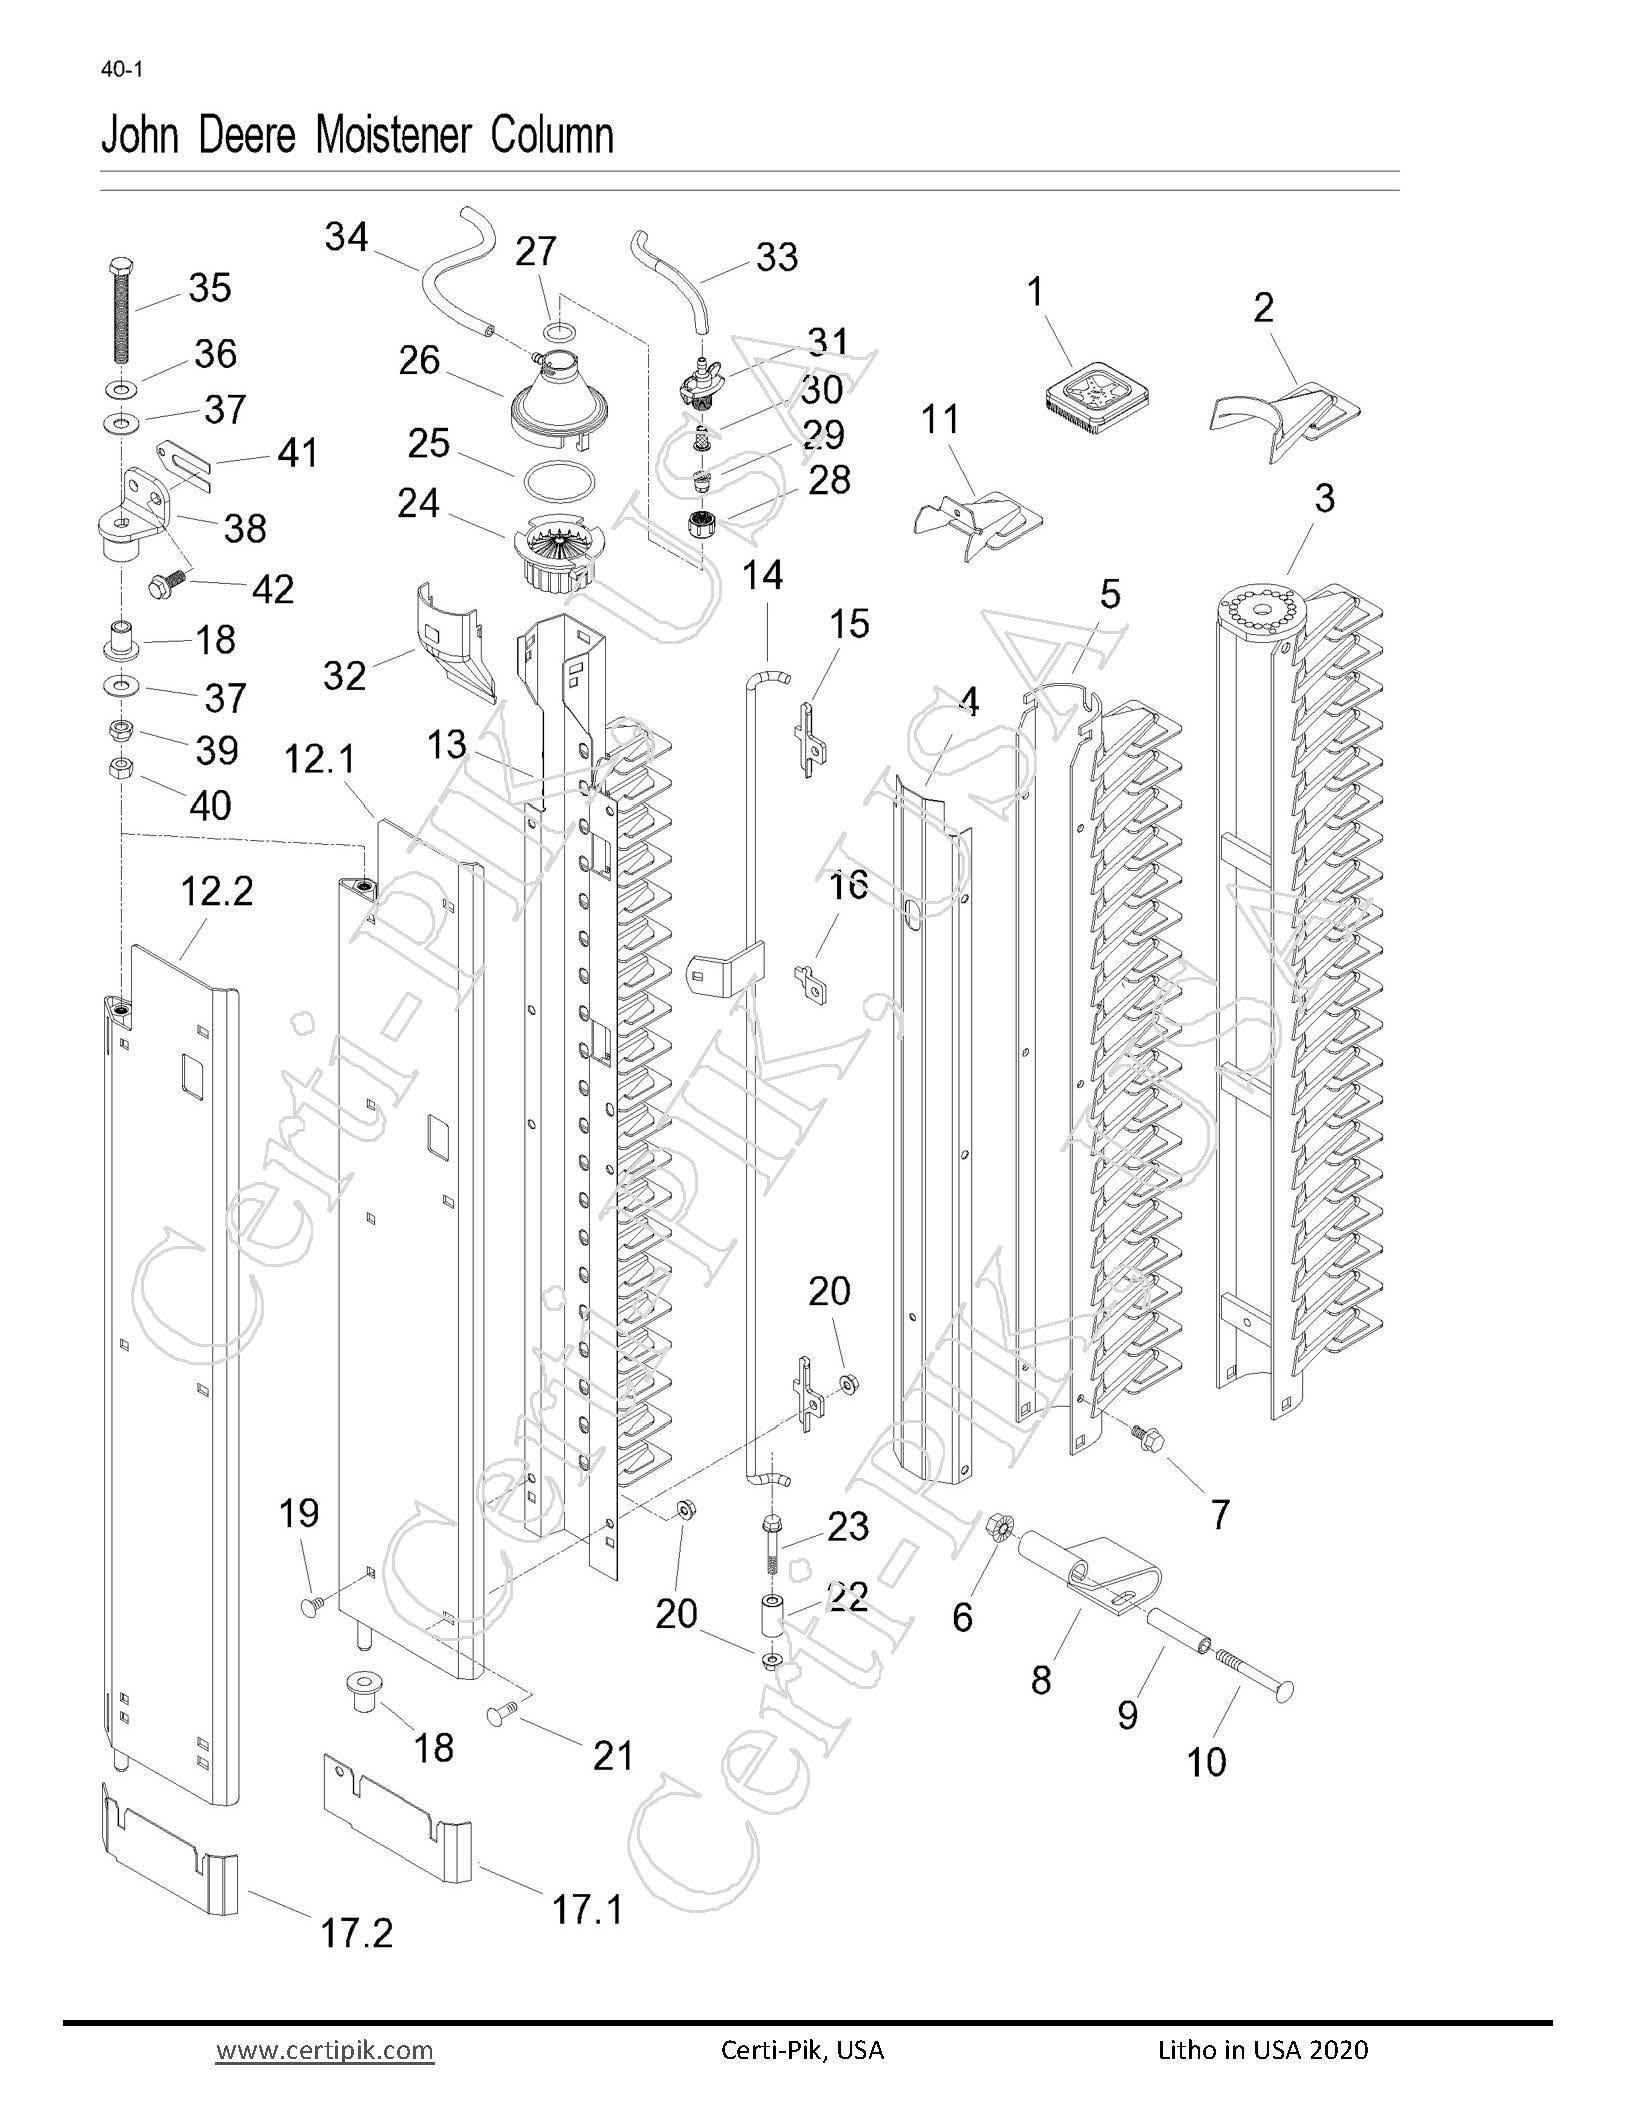 24p1 40 1 Jd Moistener Column Page 1